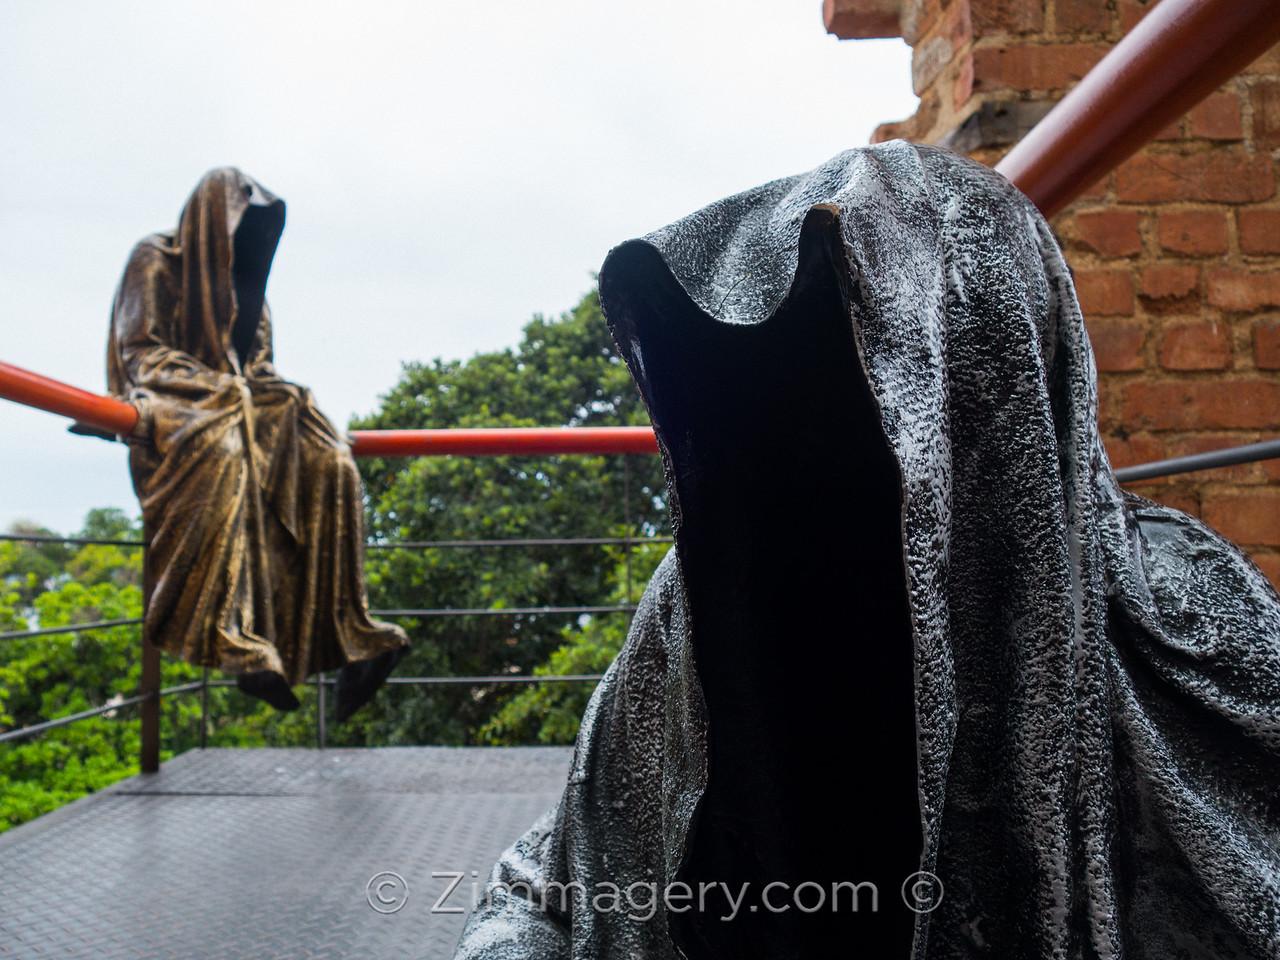 Creepy Statues in Santa Teresa, Rio do Janeiro, Brasil